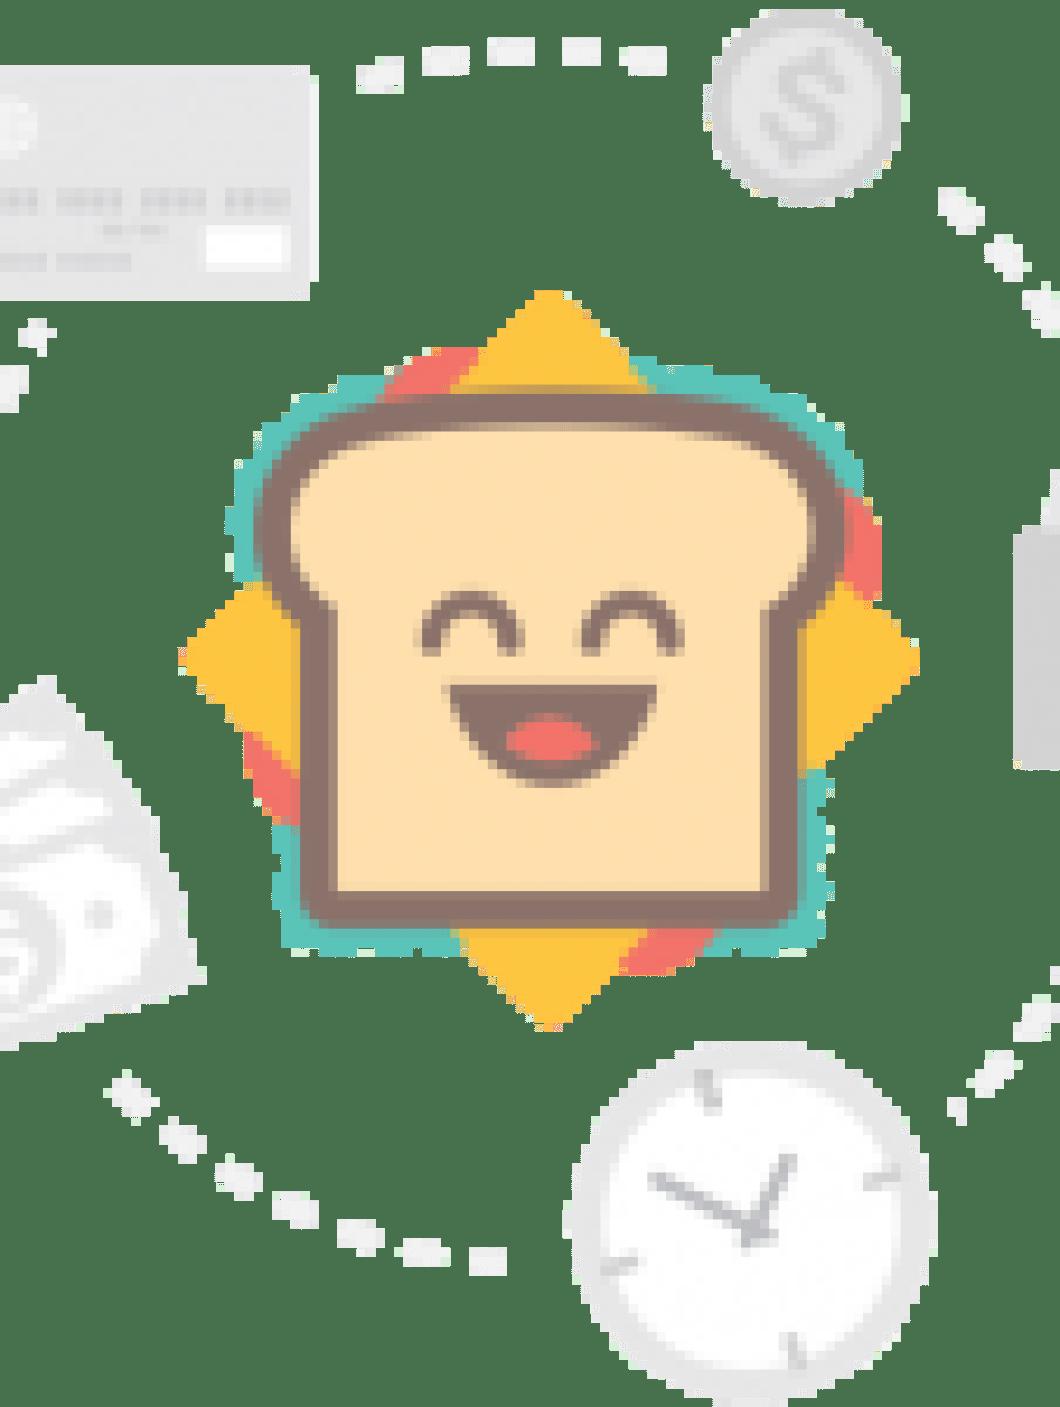 diy lip balm apivita almond oil how to use in beauty